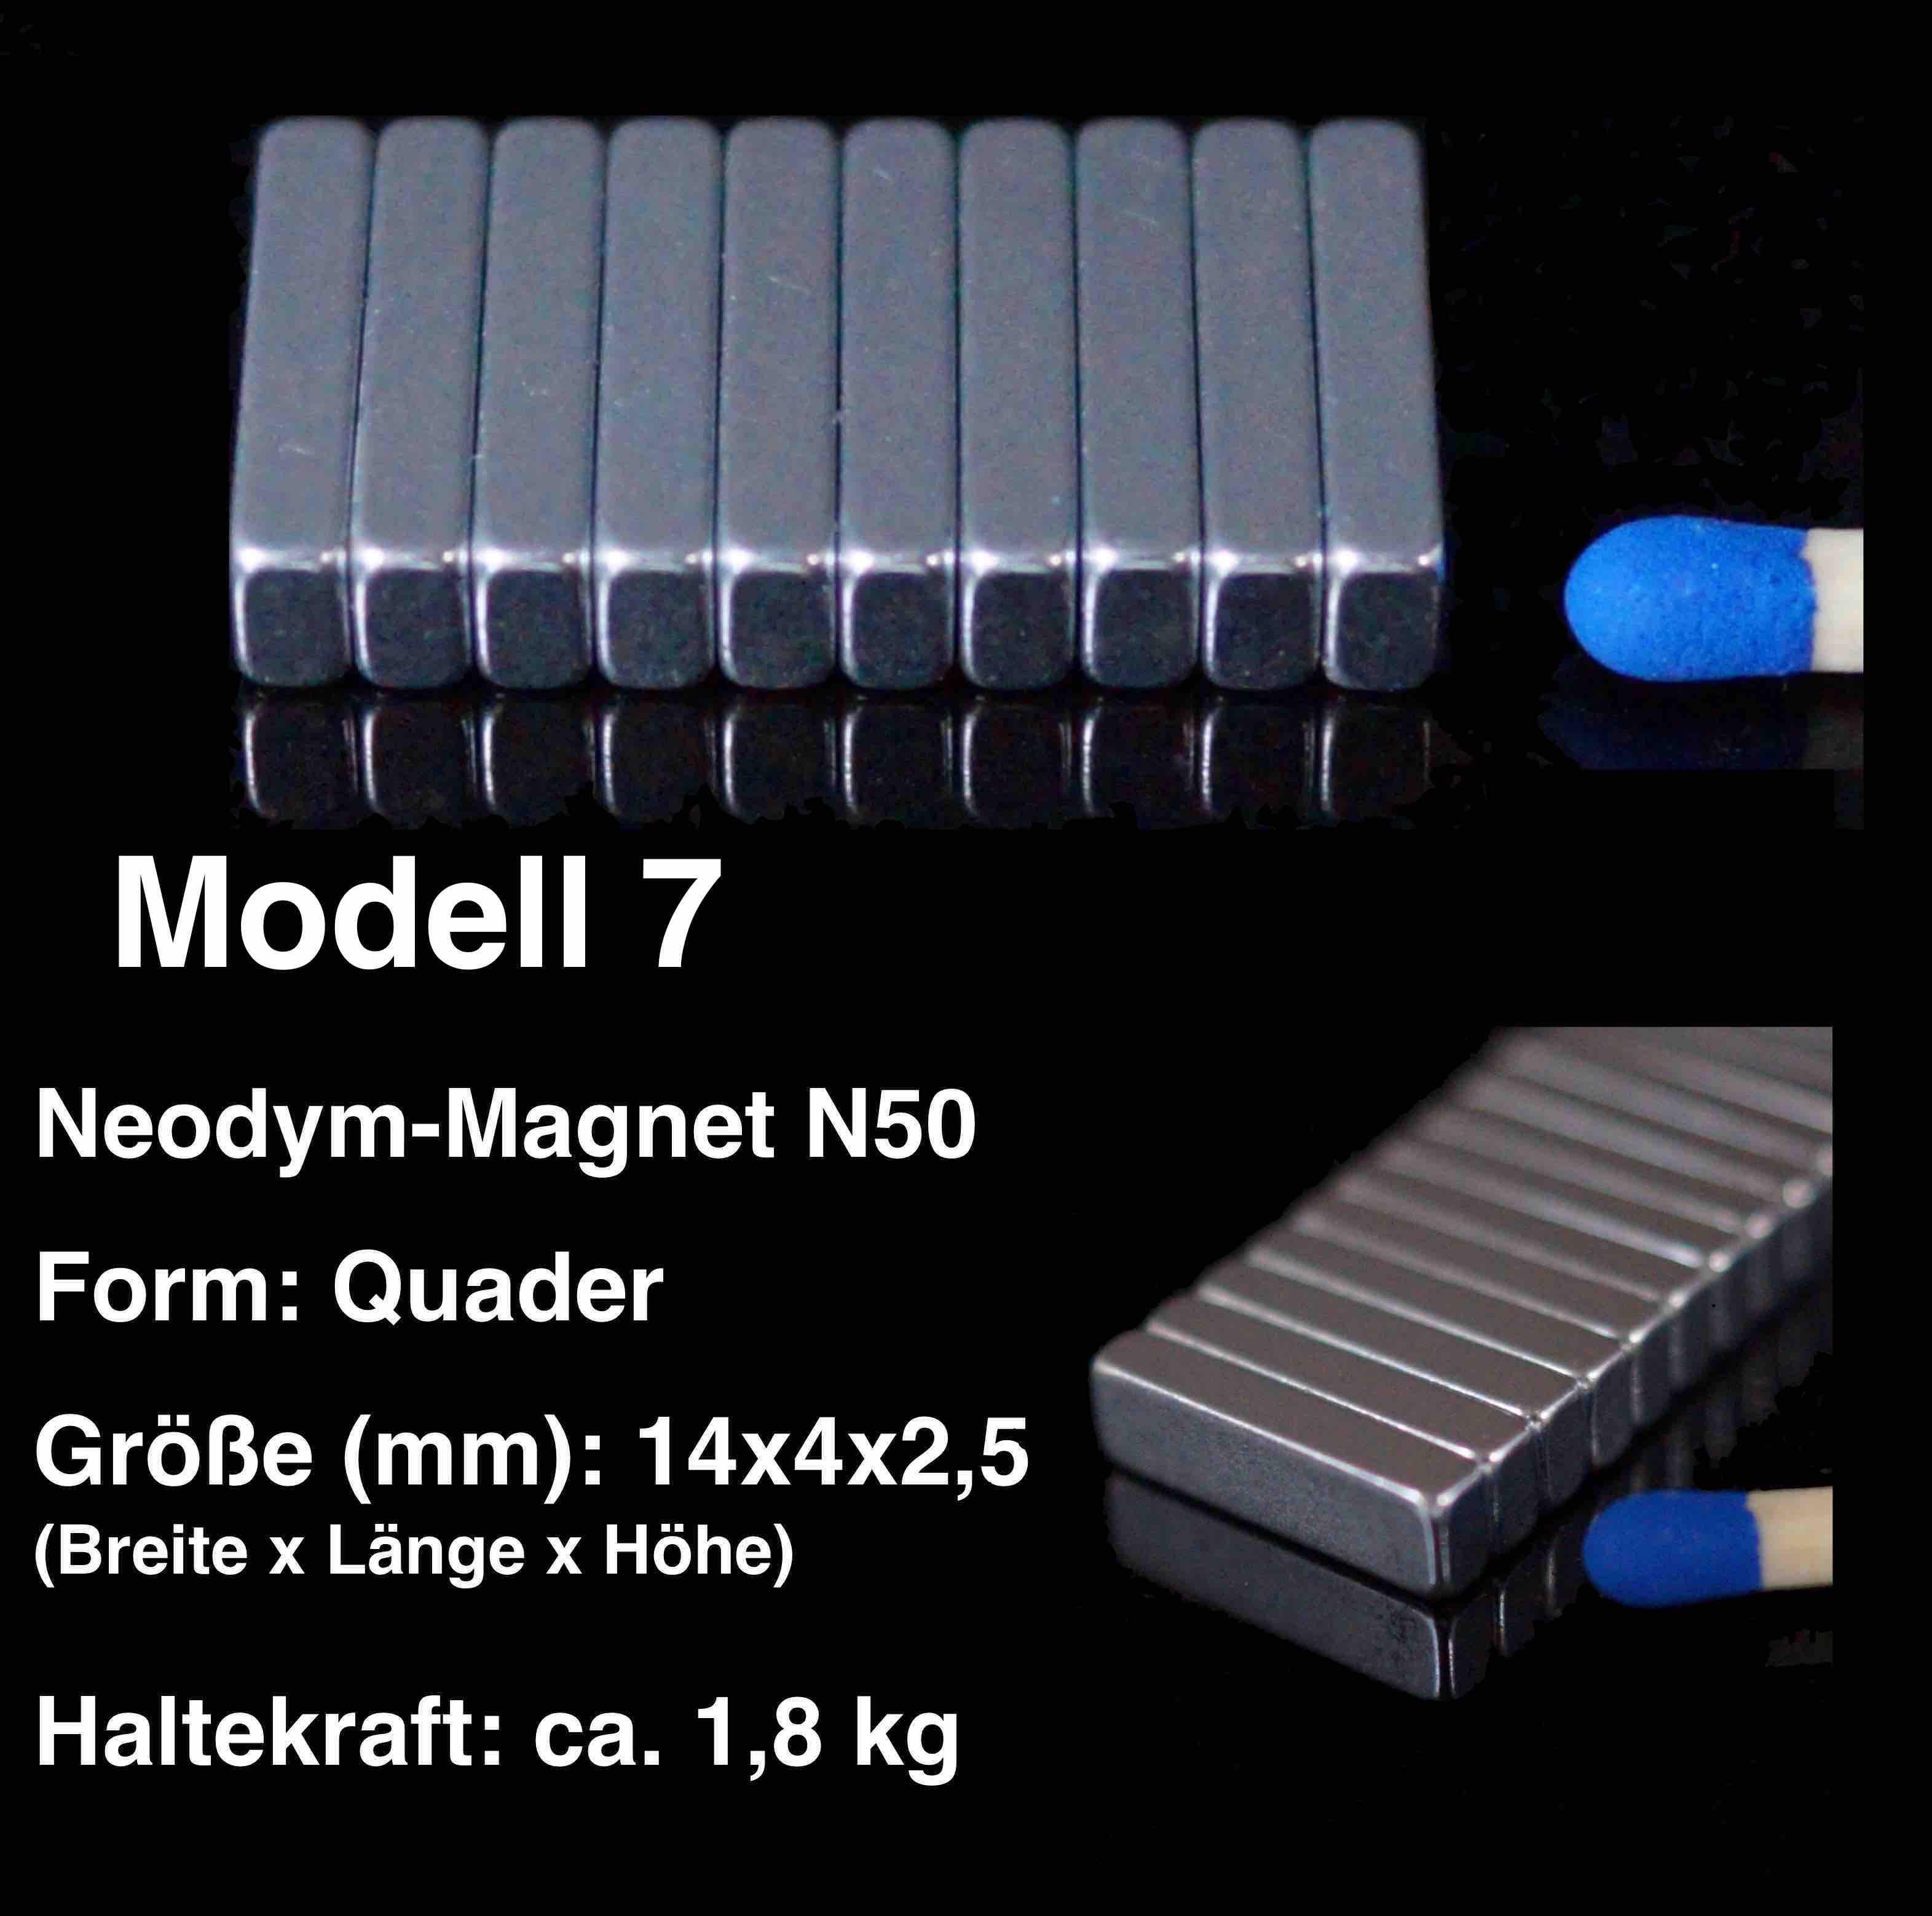 20x neodym magnete quader 14x4x2 5 mm n50 ndfeb magnet 14 x 4 x 2 5 mm ebay. Black Bedroom Furniture Sets. Home Design Ideas